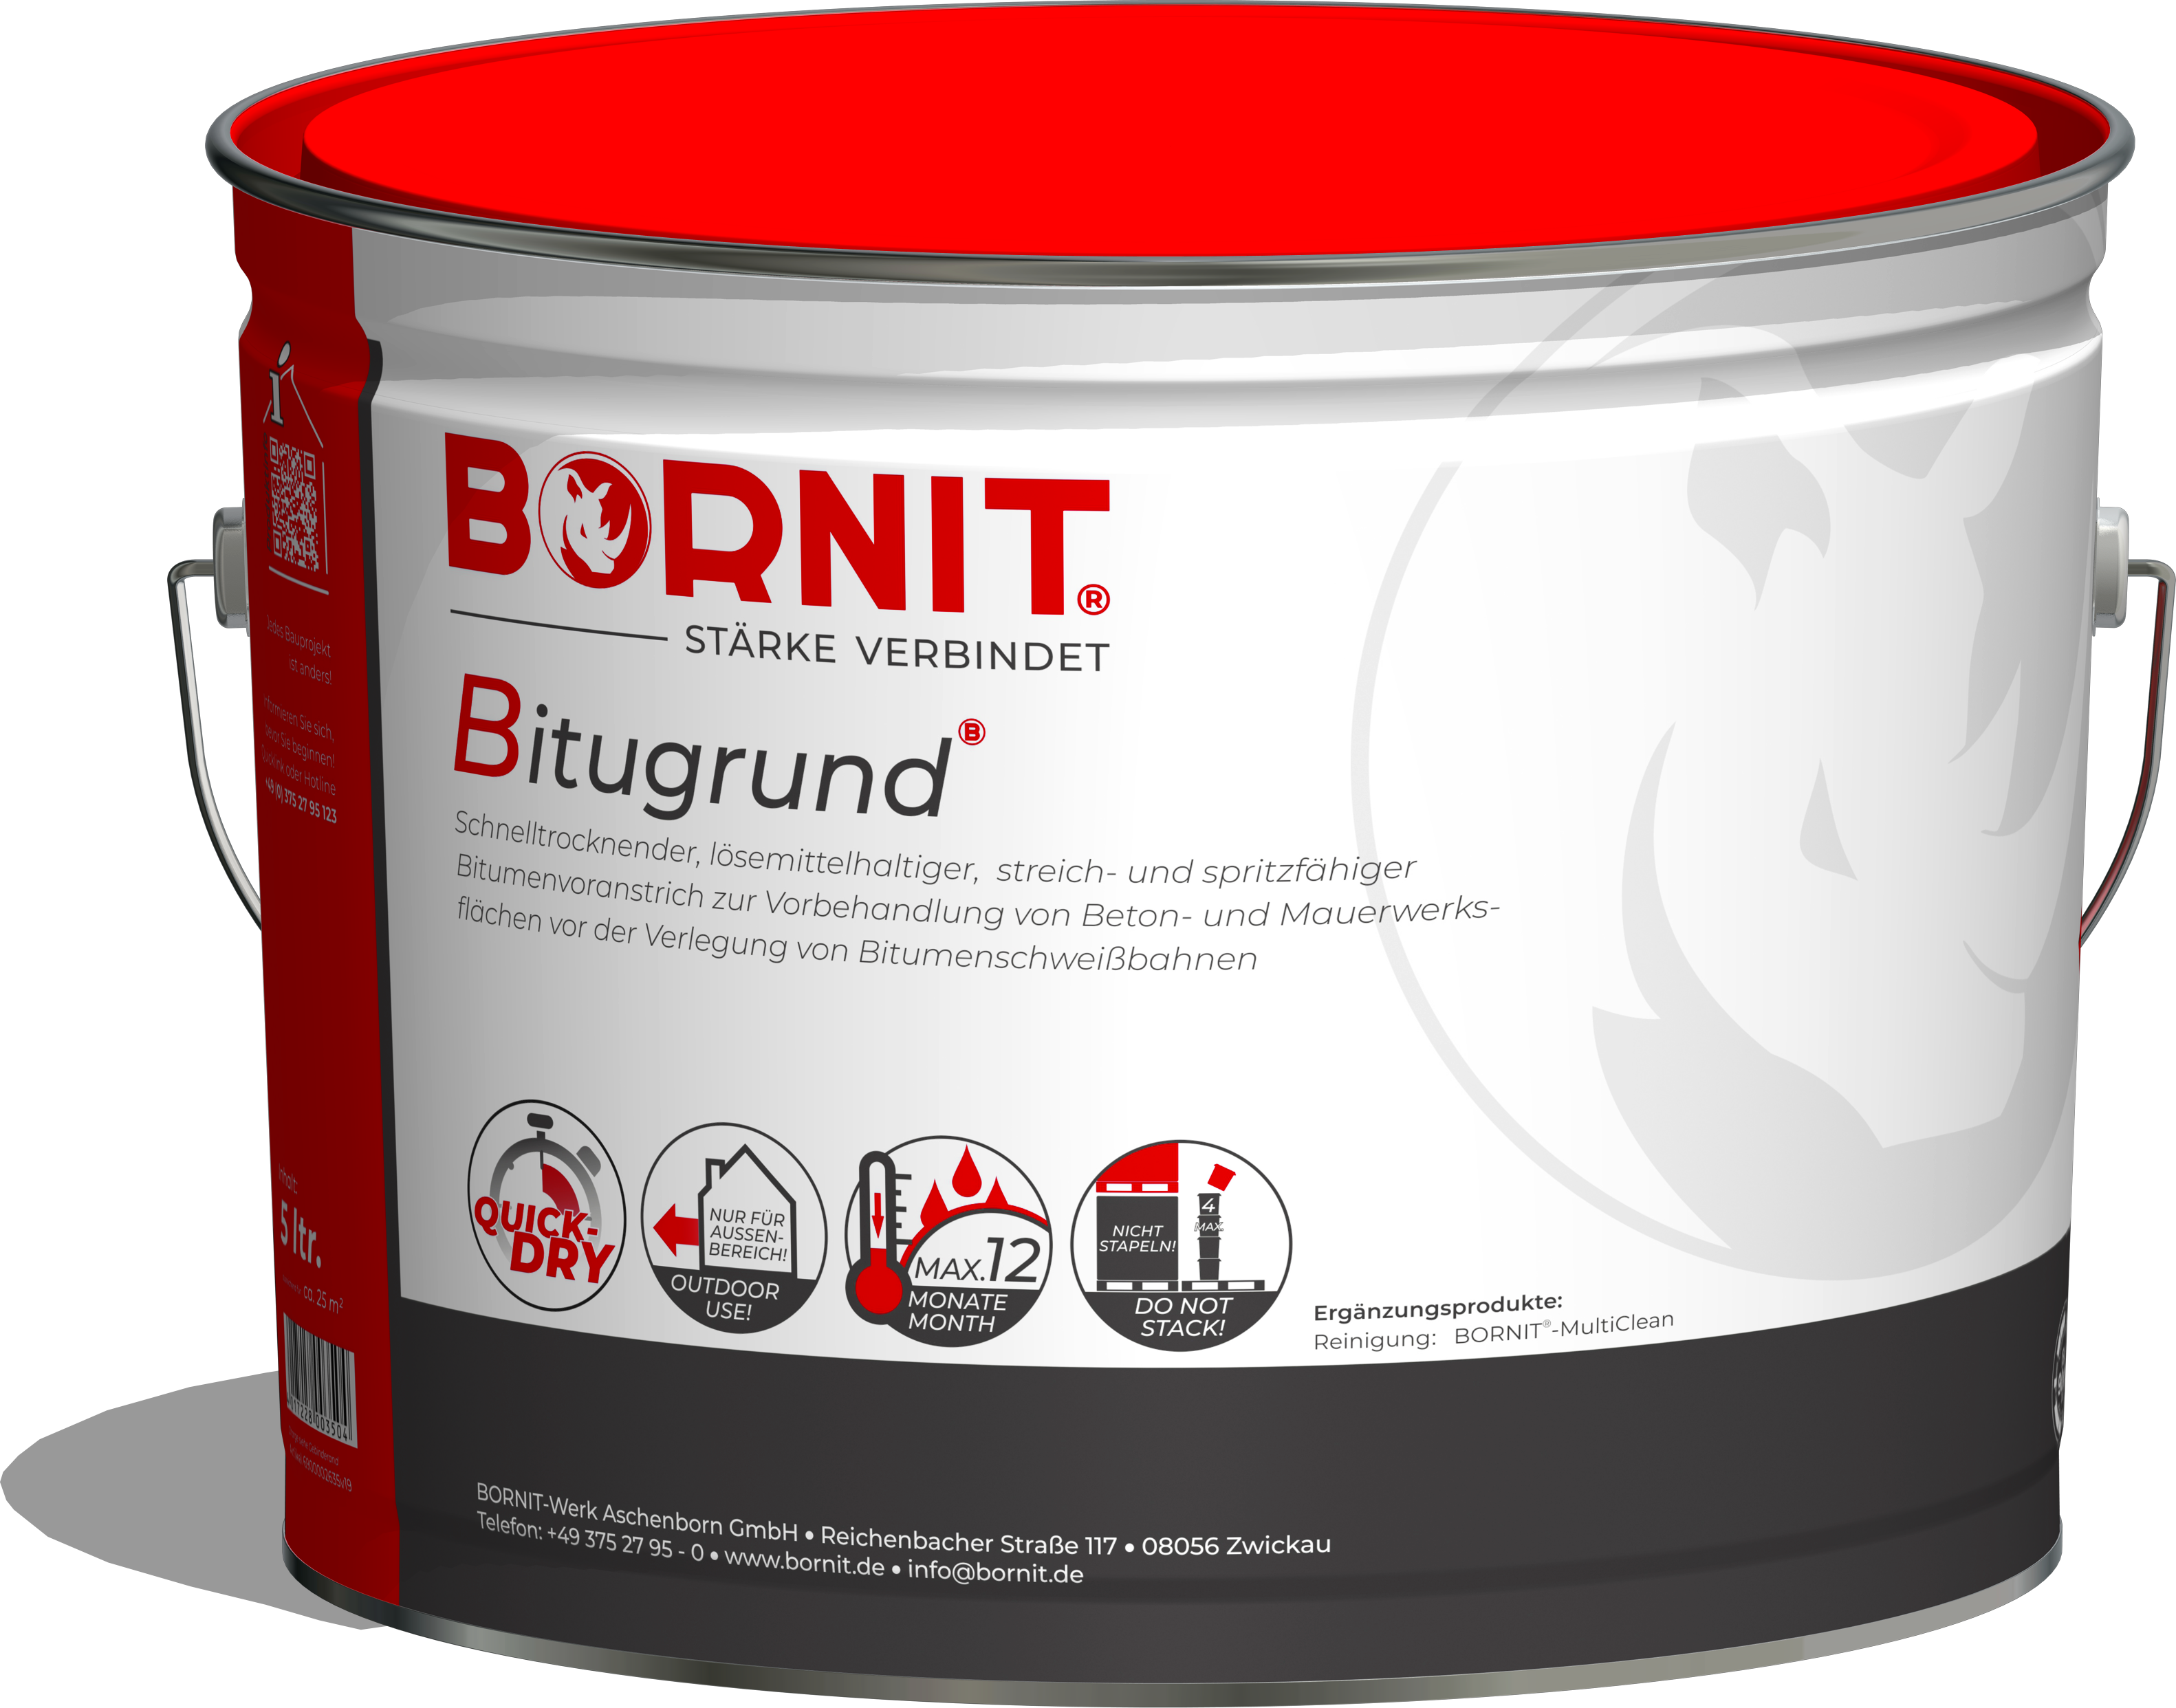 BORNIT®-Bitugrund (bitumena grunts)